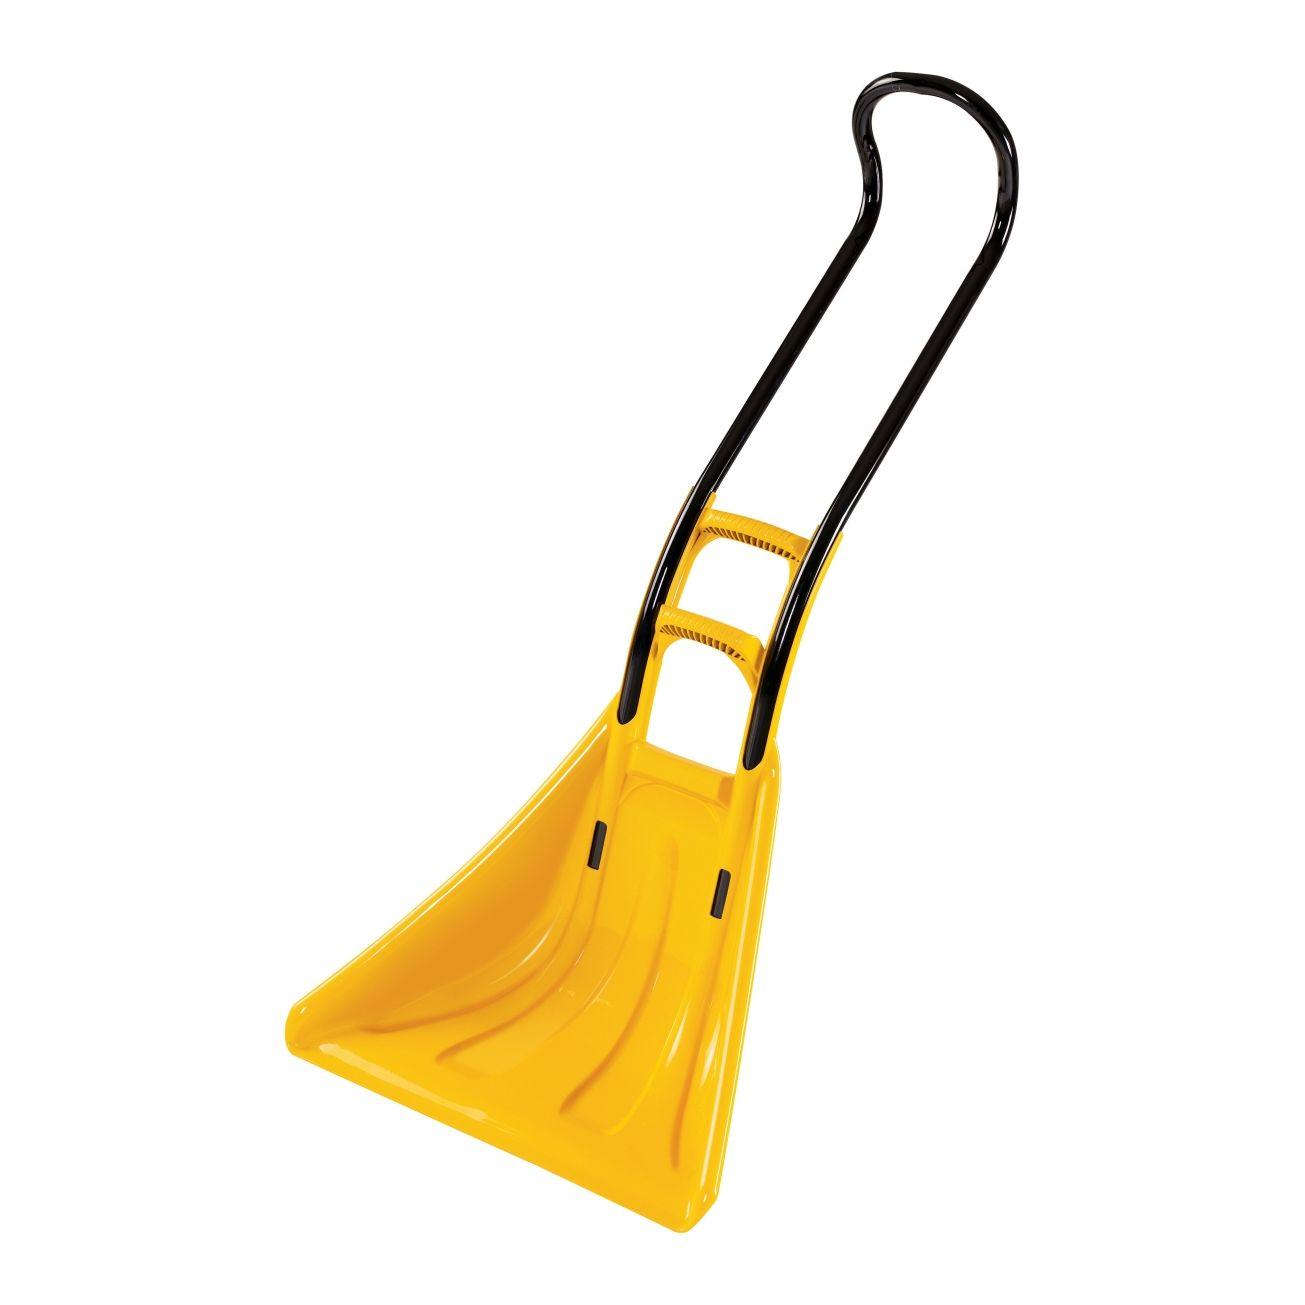 ames 24in snowboss poly snow shovel 1625300 snow shovels